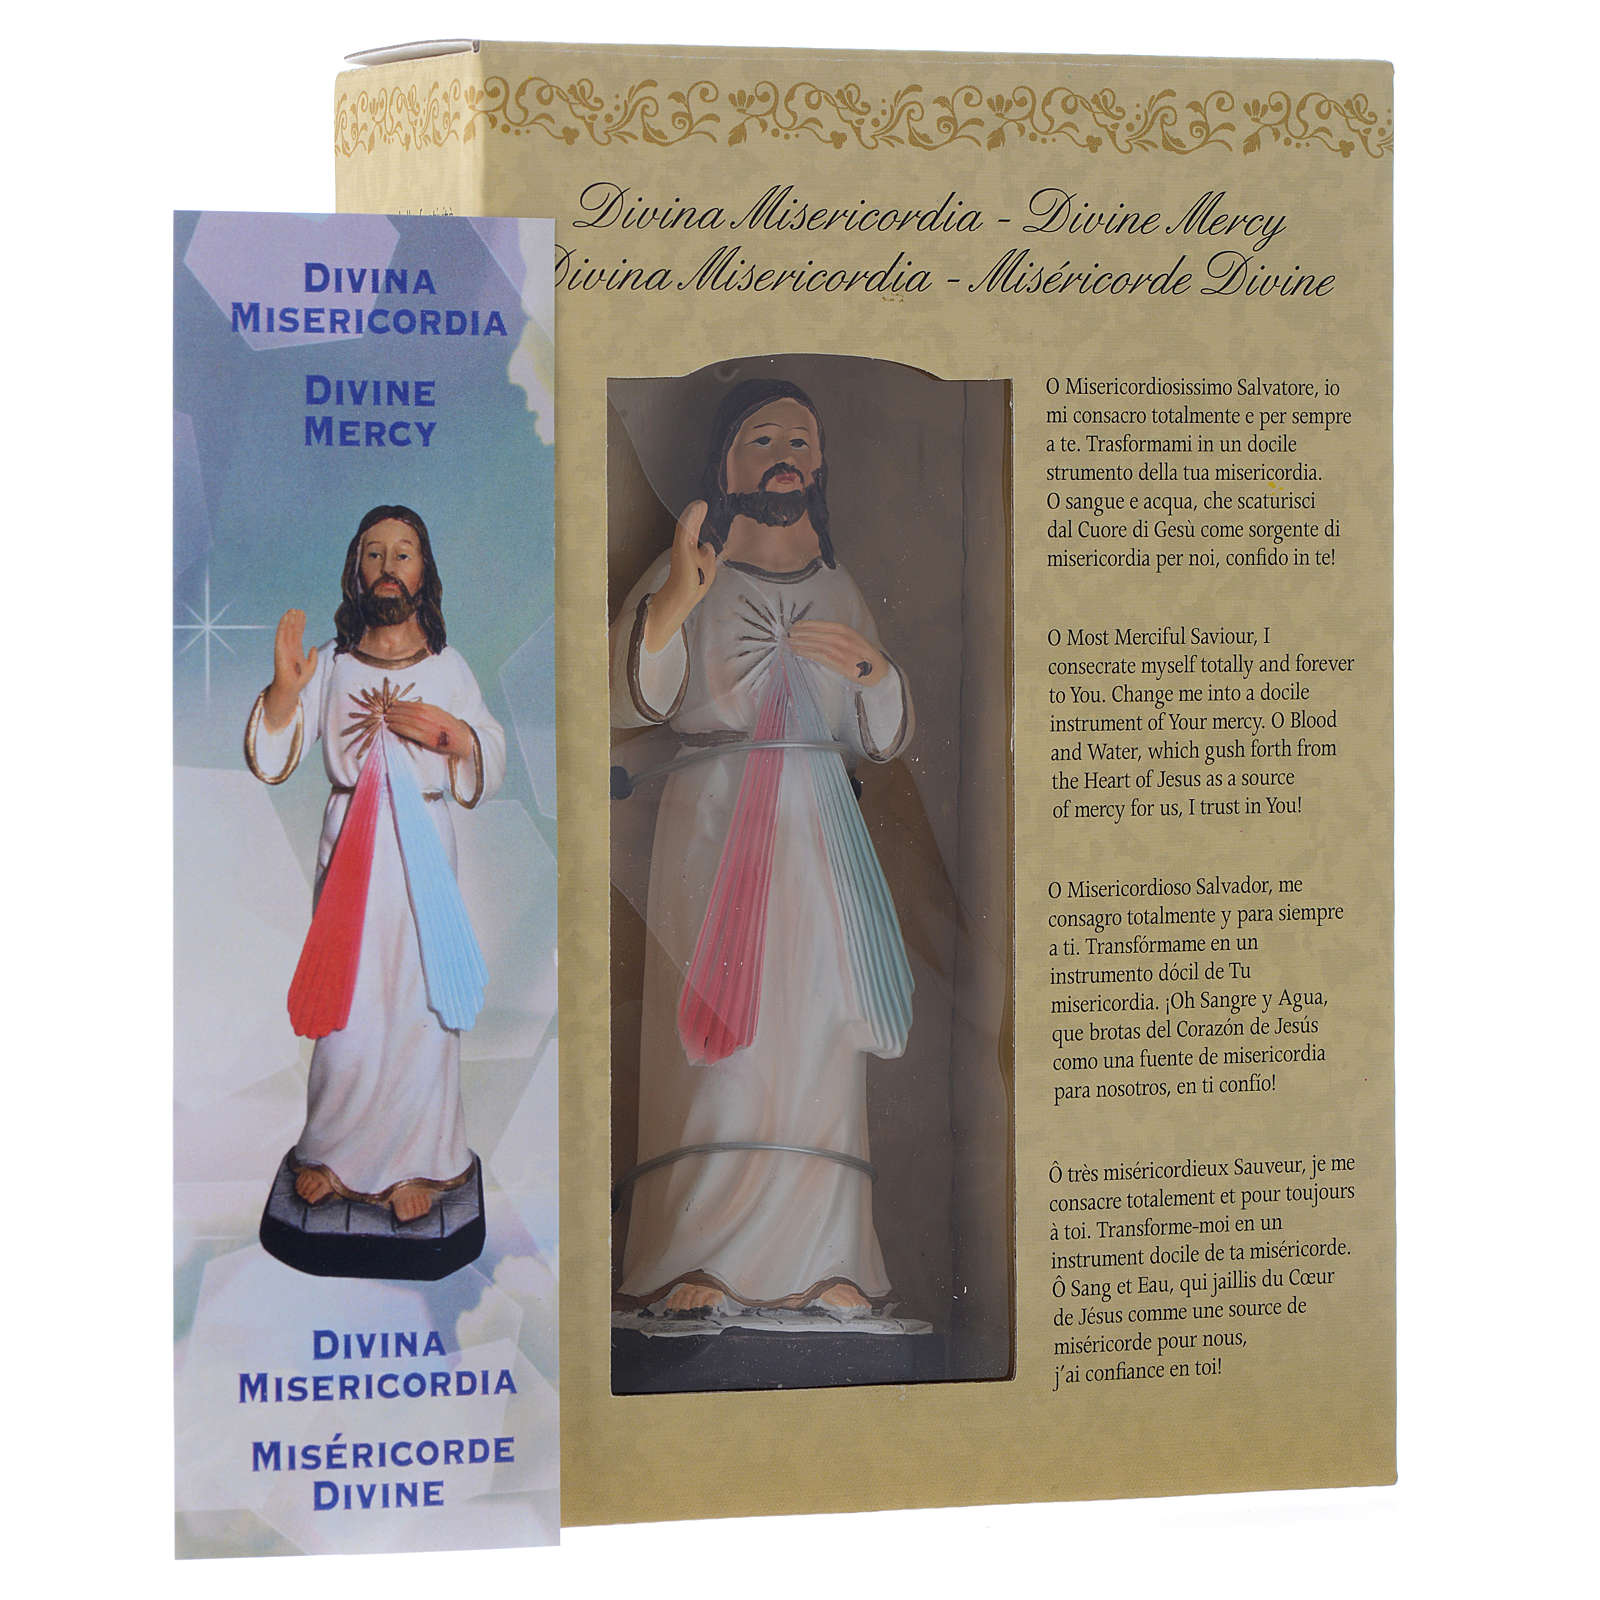 Cristo Misericordioso 12 cm pvc caixa ORAÇÃO MULTILINGUE 4